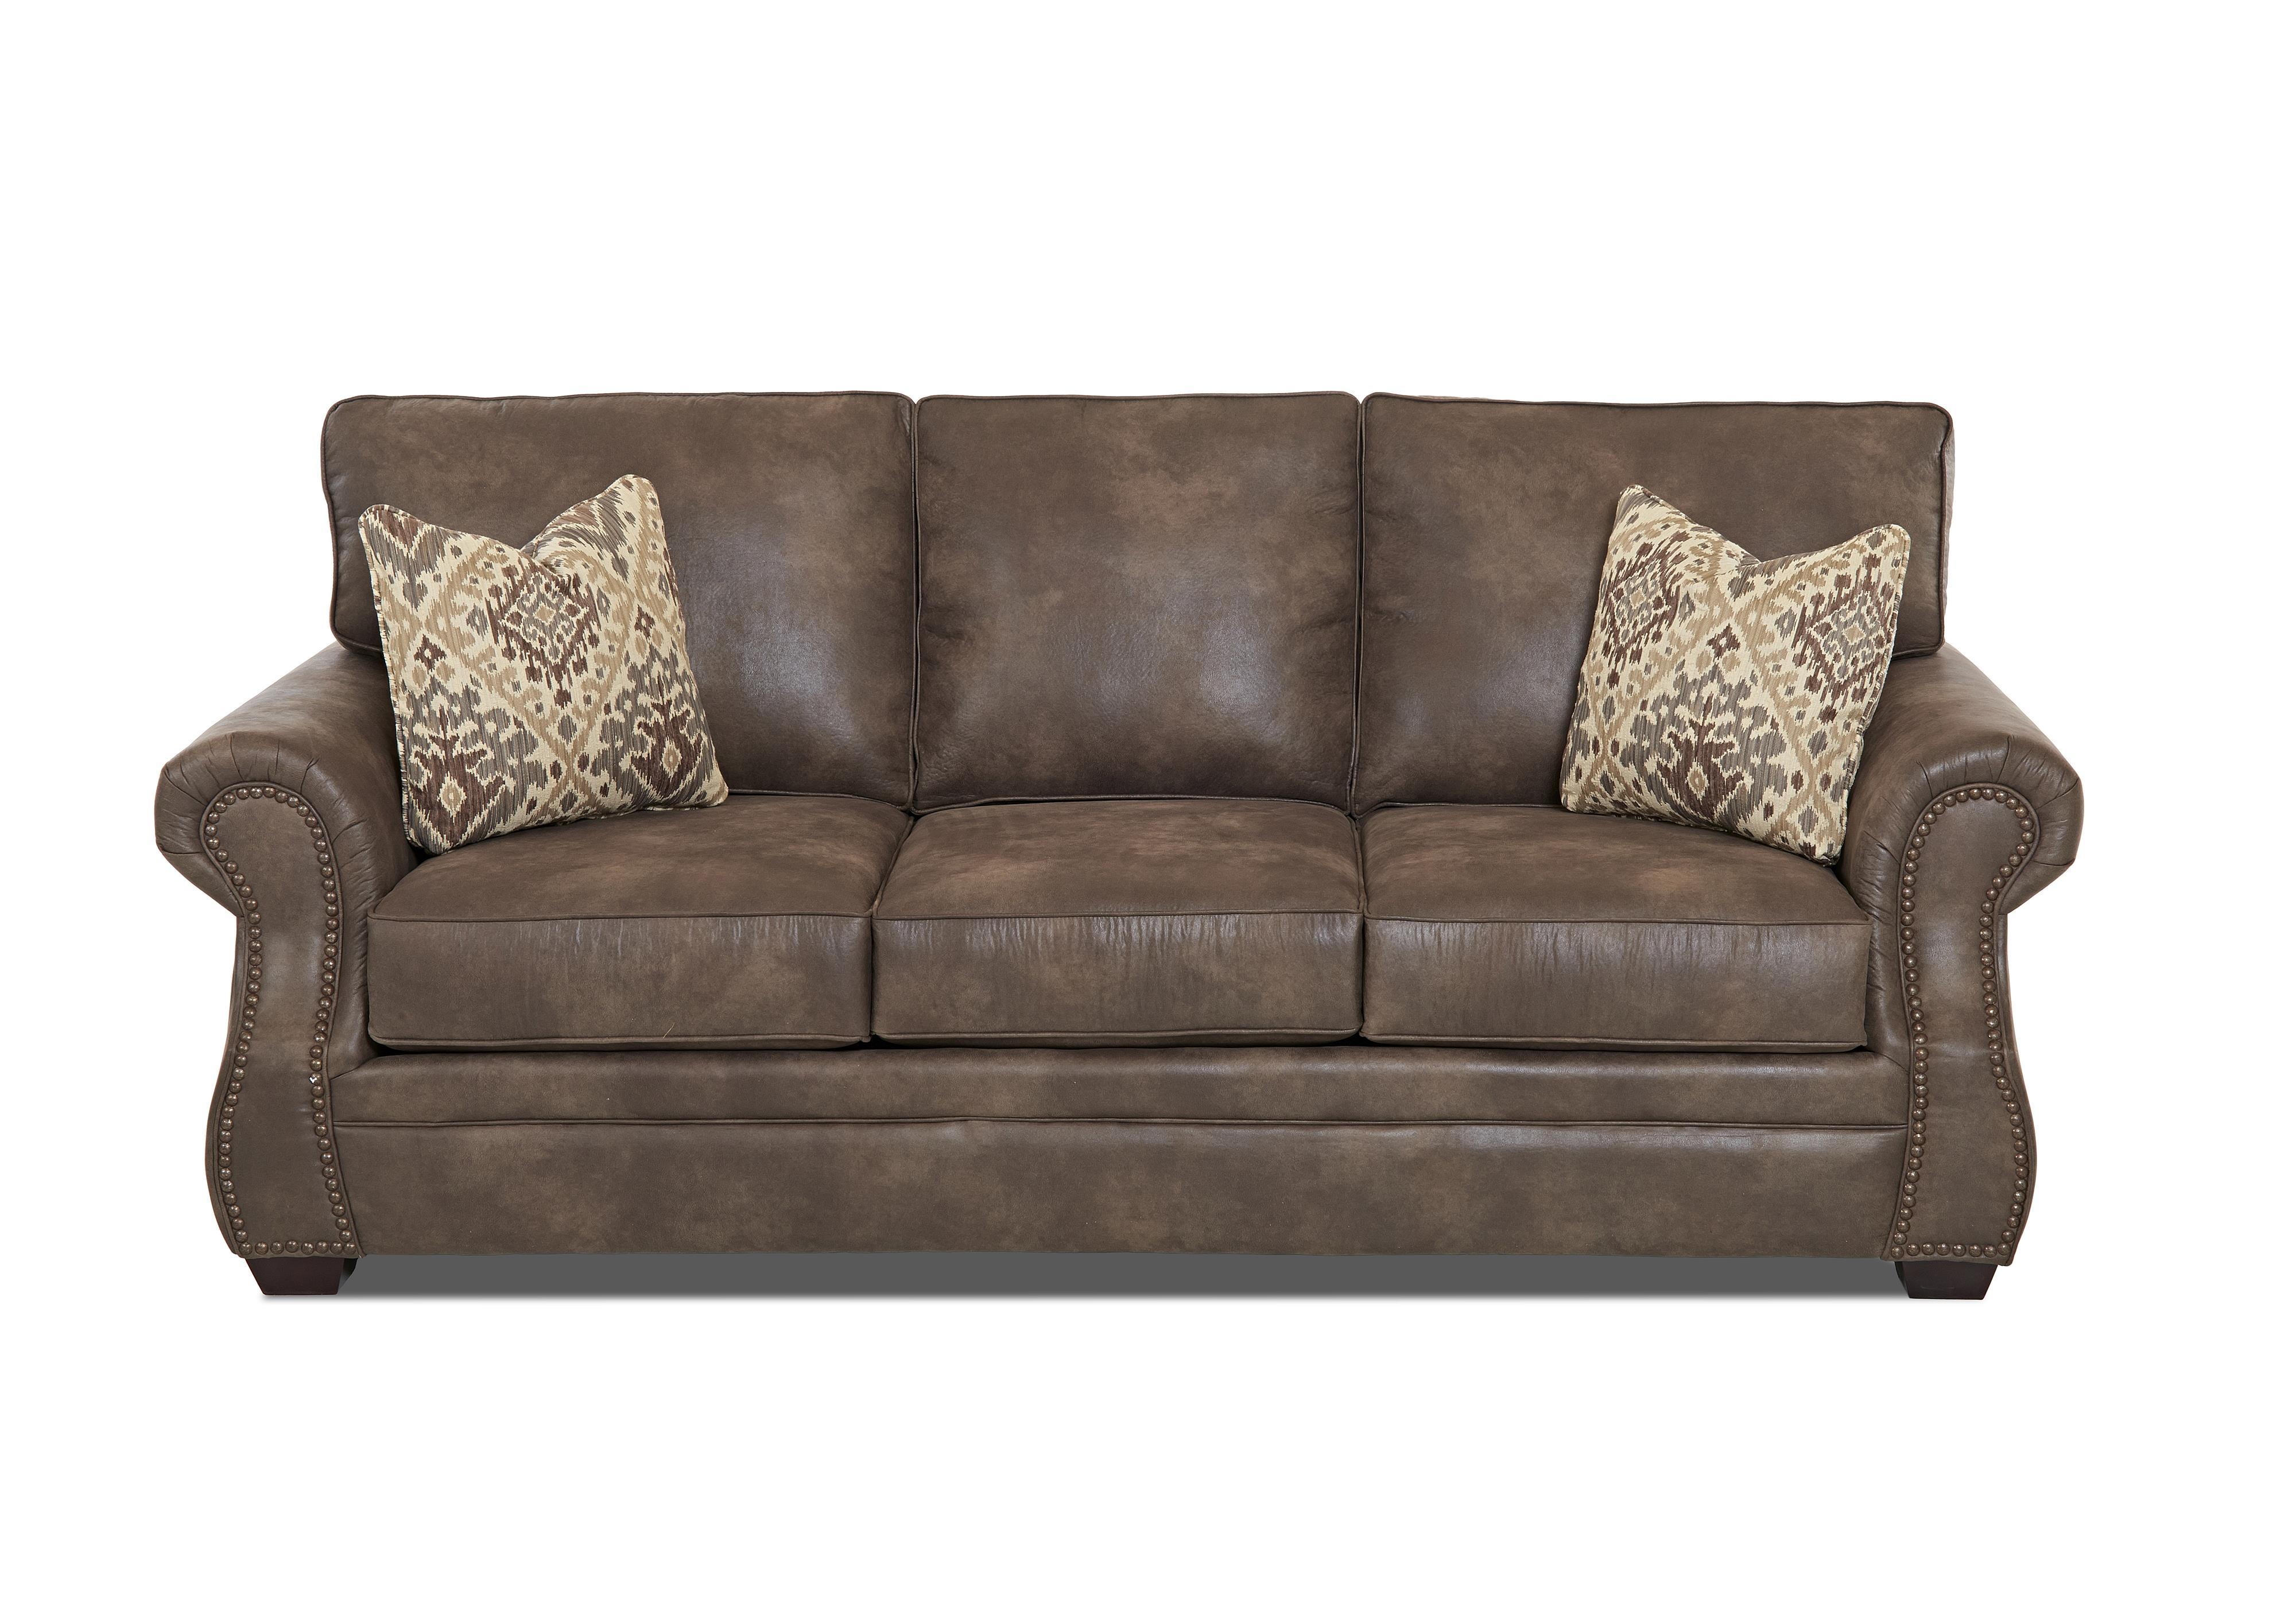 klaussner jasper traditional air coil mattress sleeper sofa with nailhead trim value city. Black Bedroom Furniture Sets. Home Design Ideas